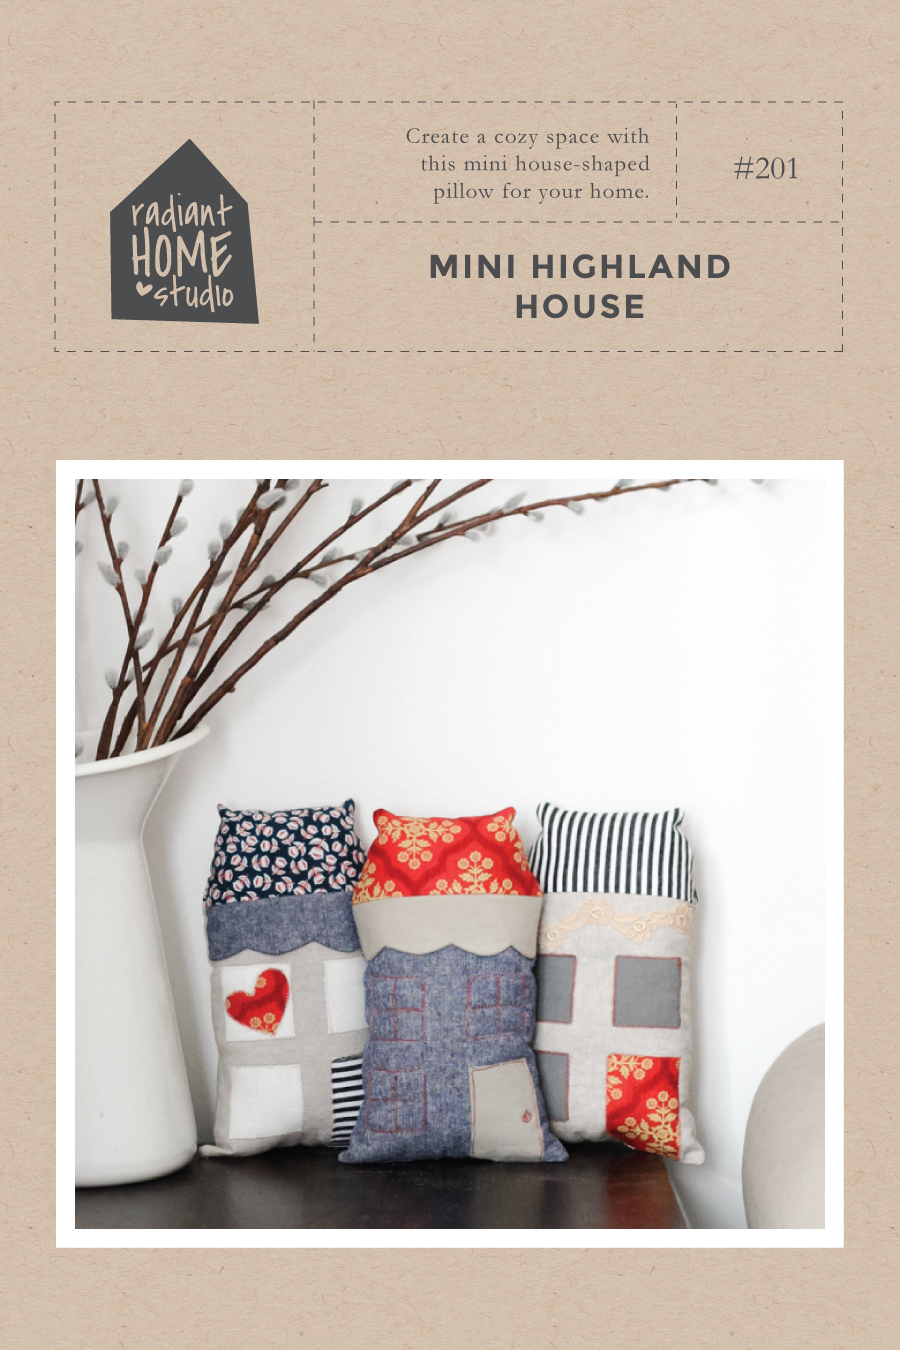 Mini Highland House Sewing pattern   Radiant Home Studio